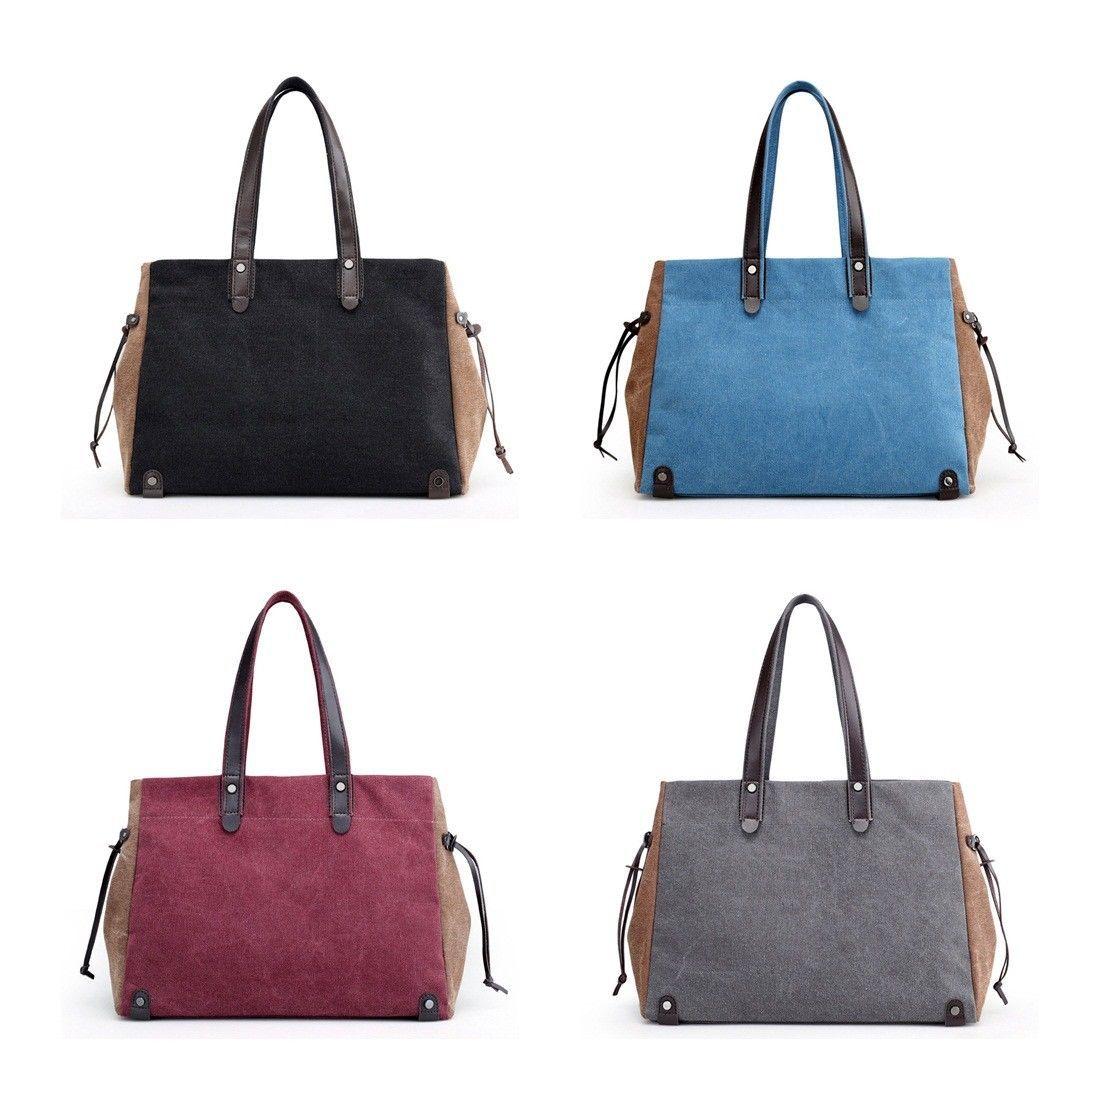 c9b1ab62ce43 Women Girls Fashion Travel Casual Work Shoulder Satchel Bag Tote Purse  Handbag